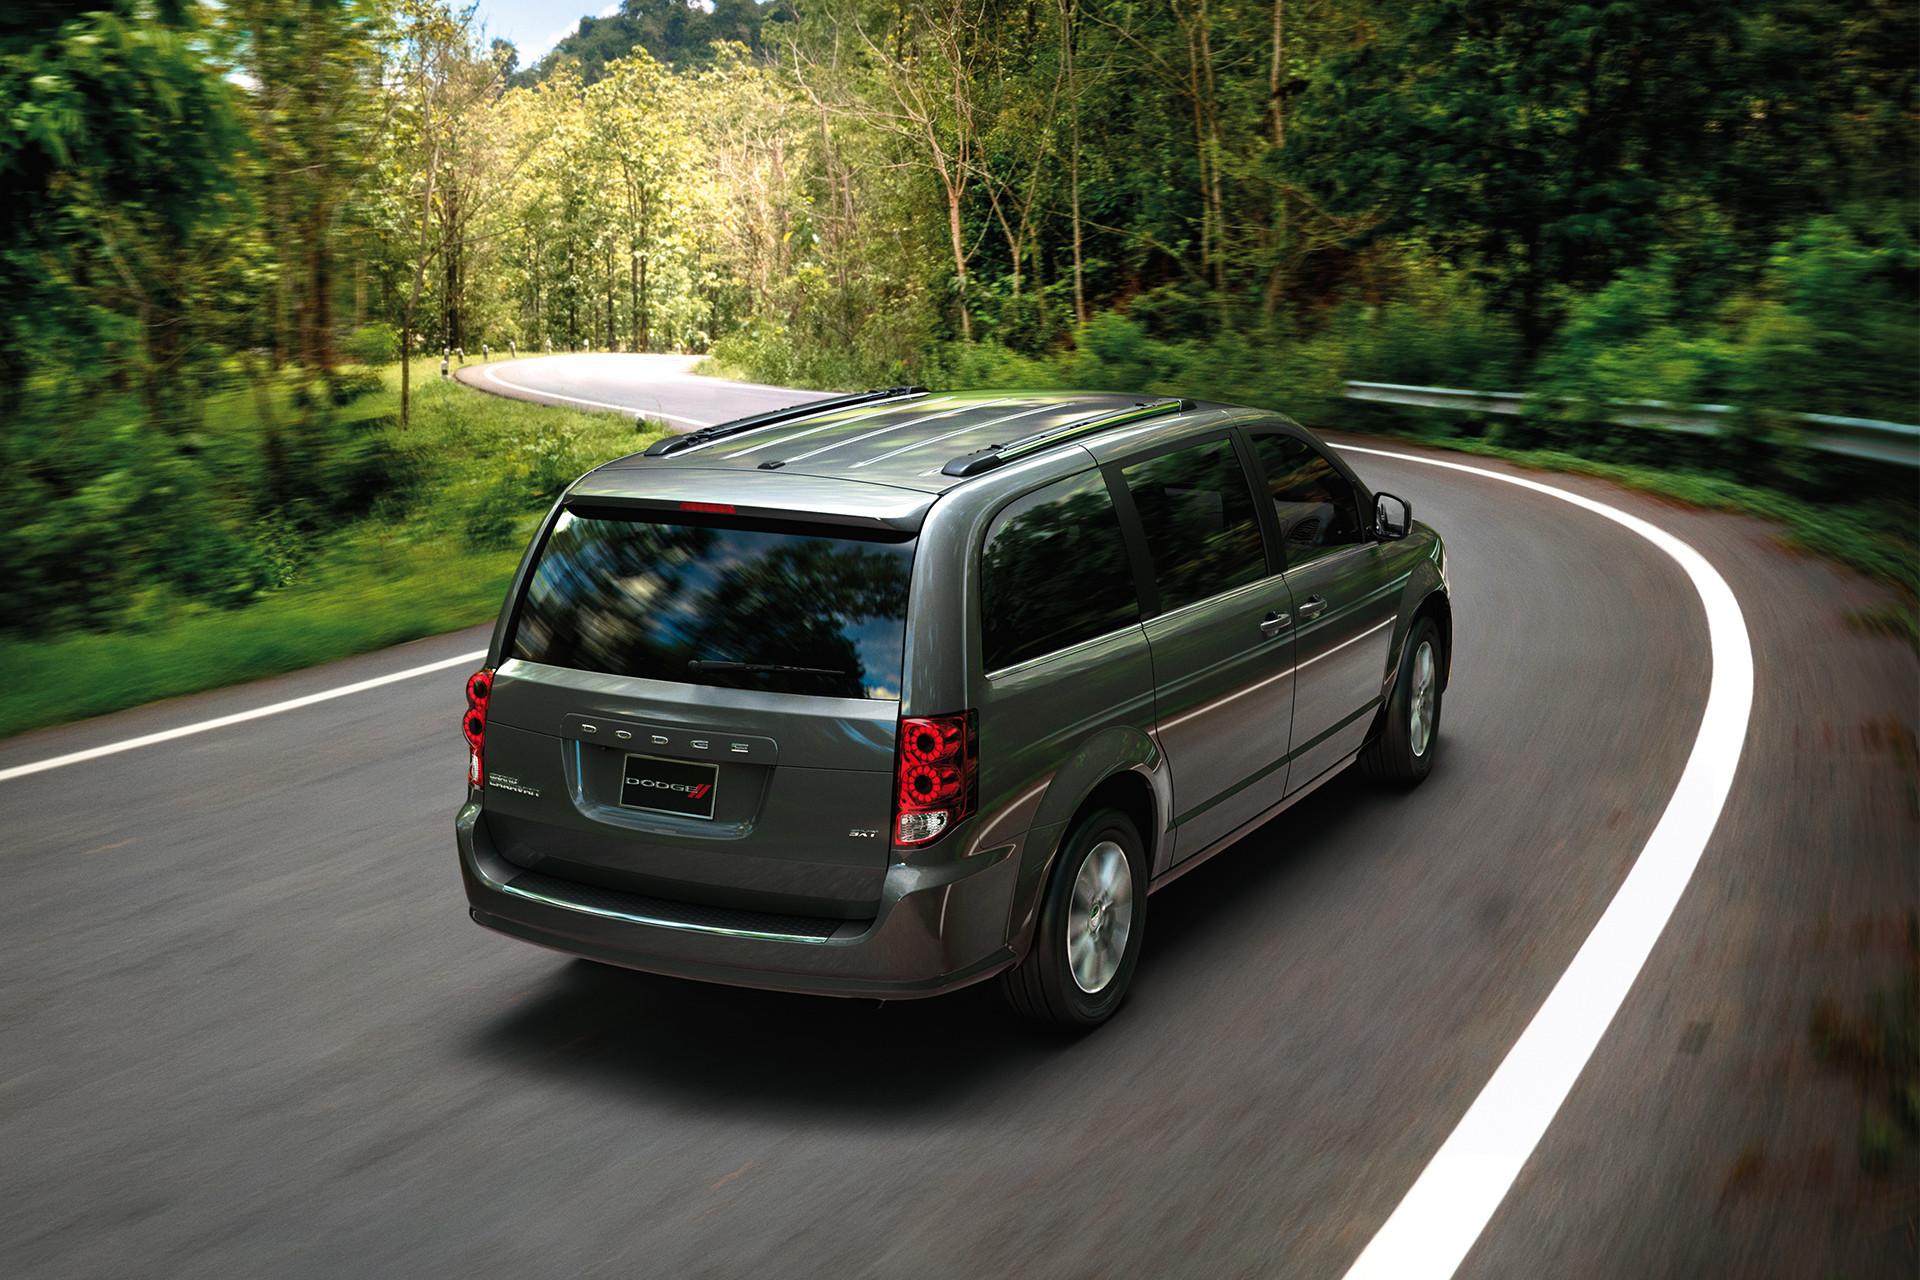 2020 Dodge Grand Caravan Exterior Gallery Dodge Canada